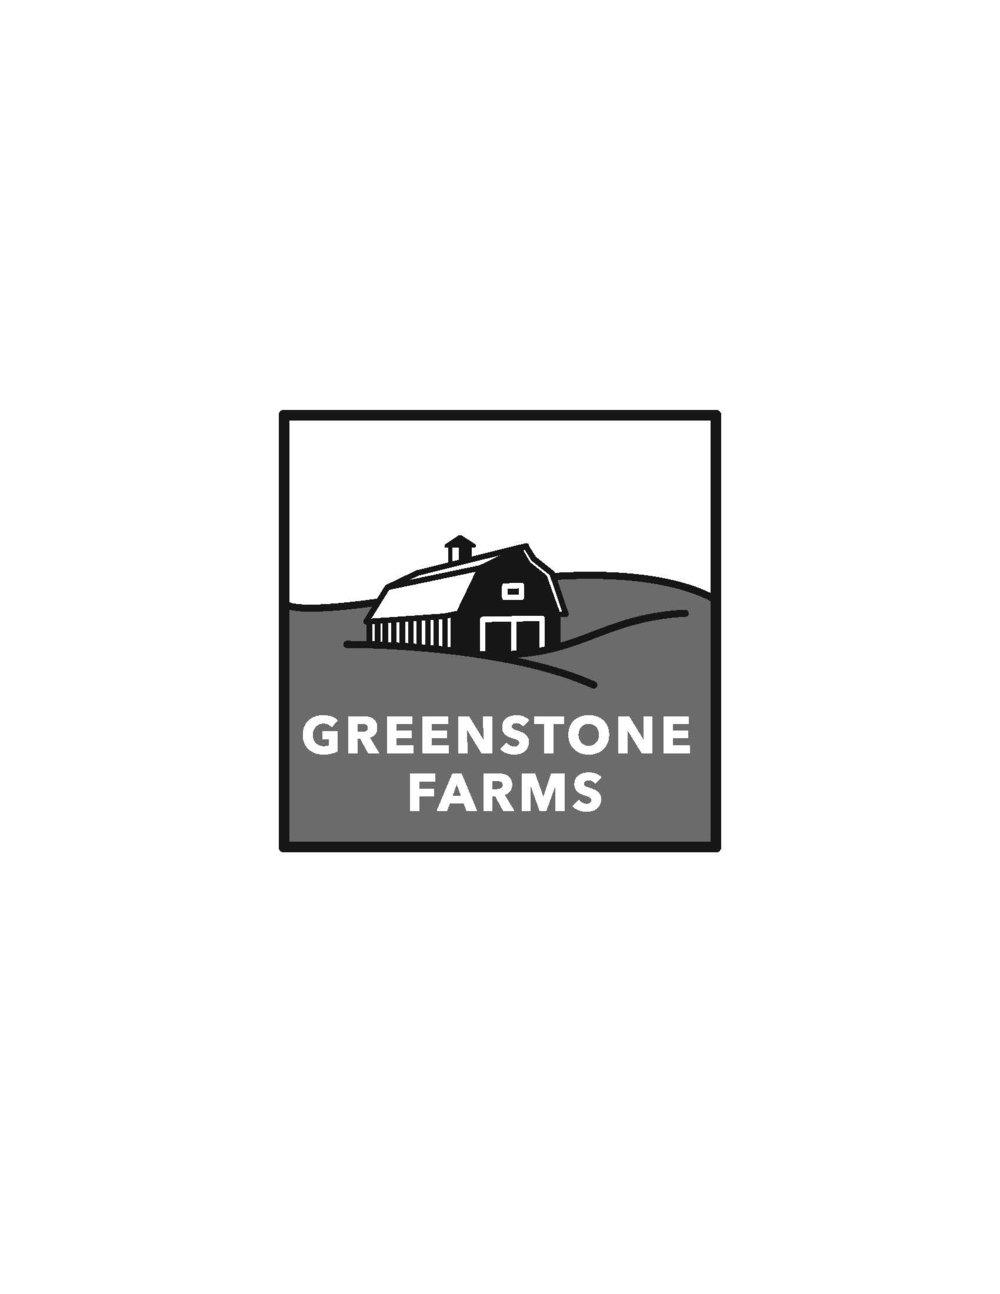 greenstone_logo.10.21.16_Page_2.jpg